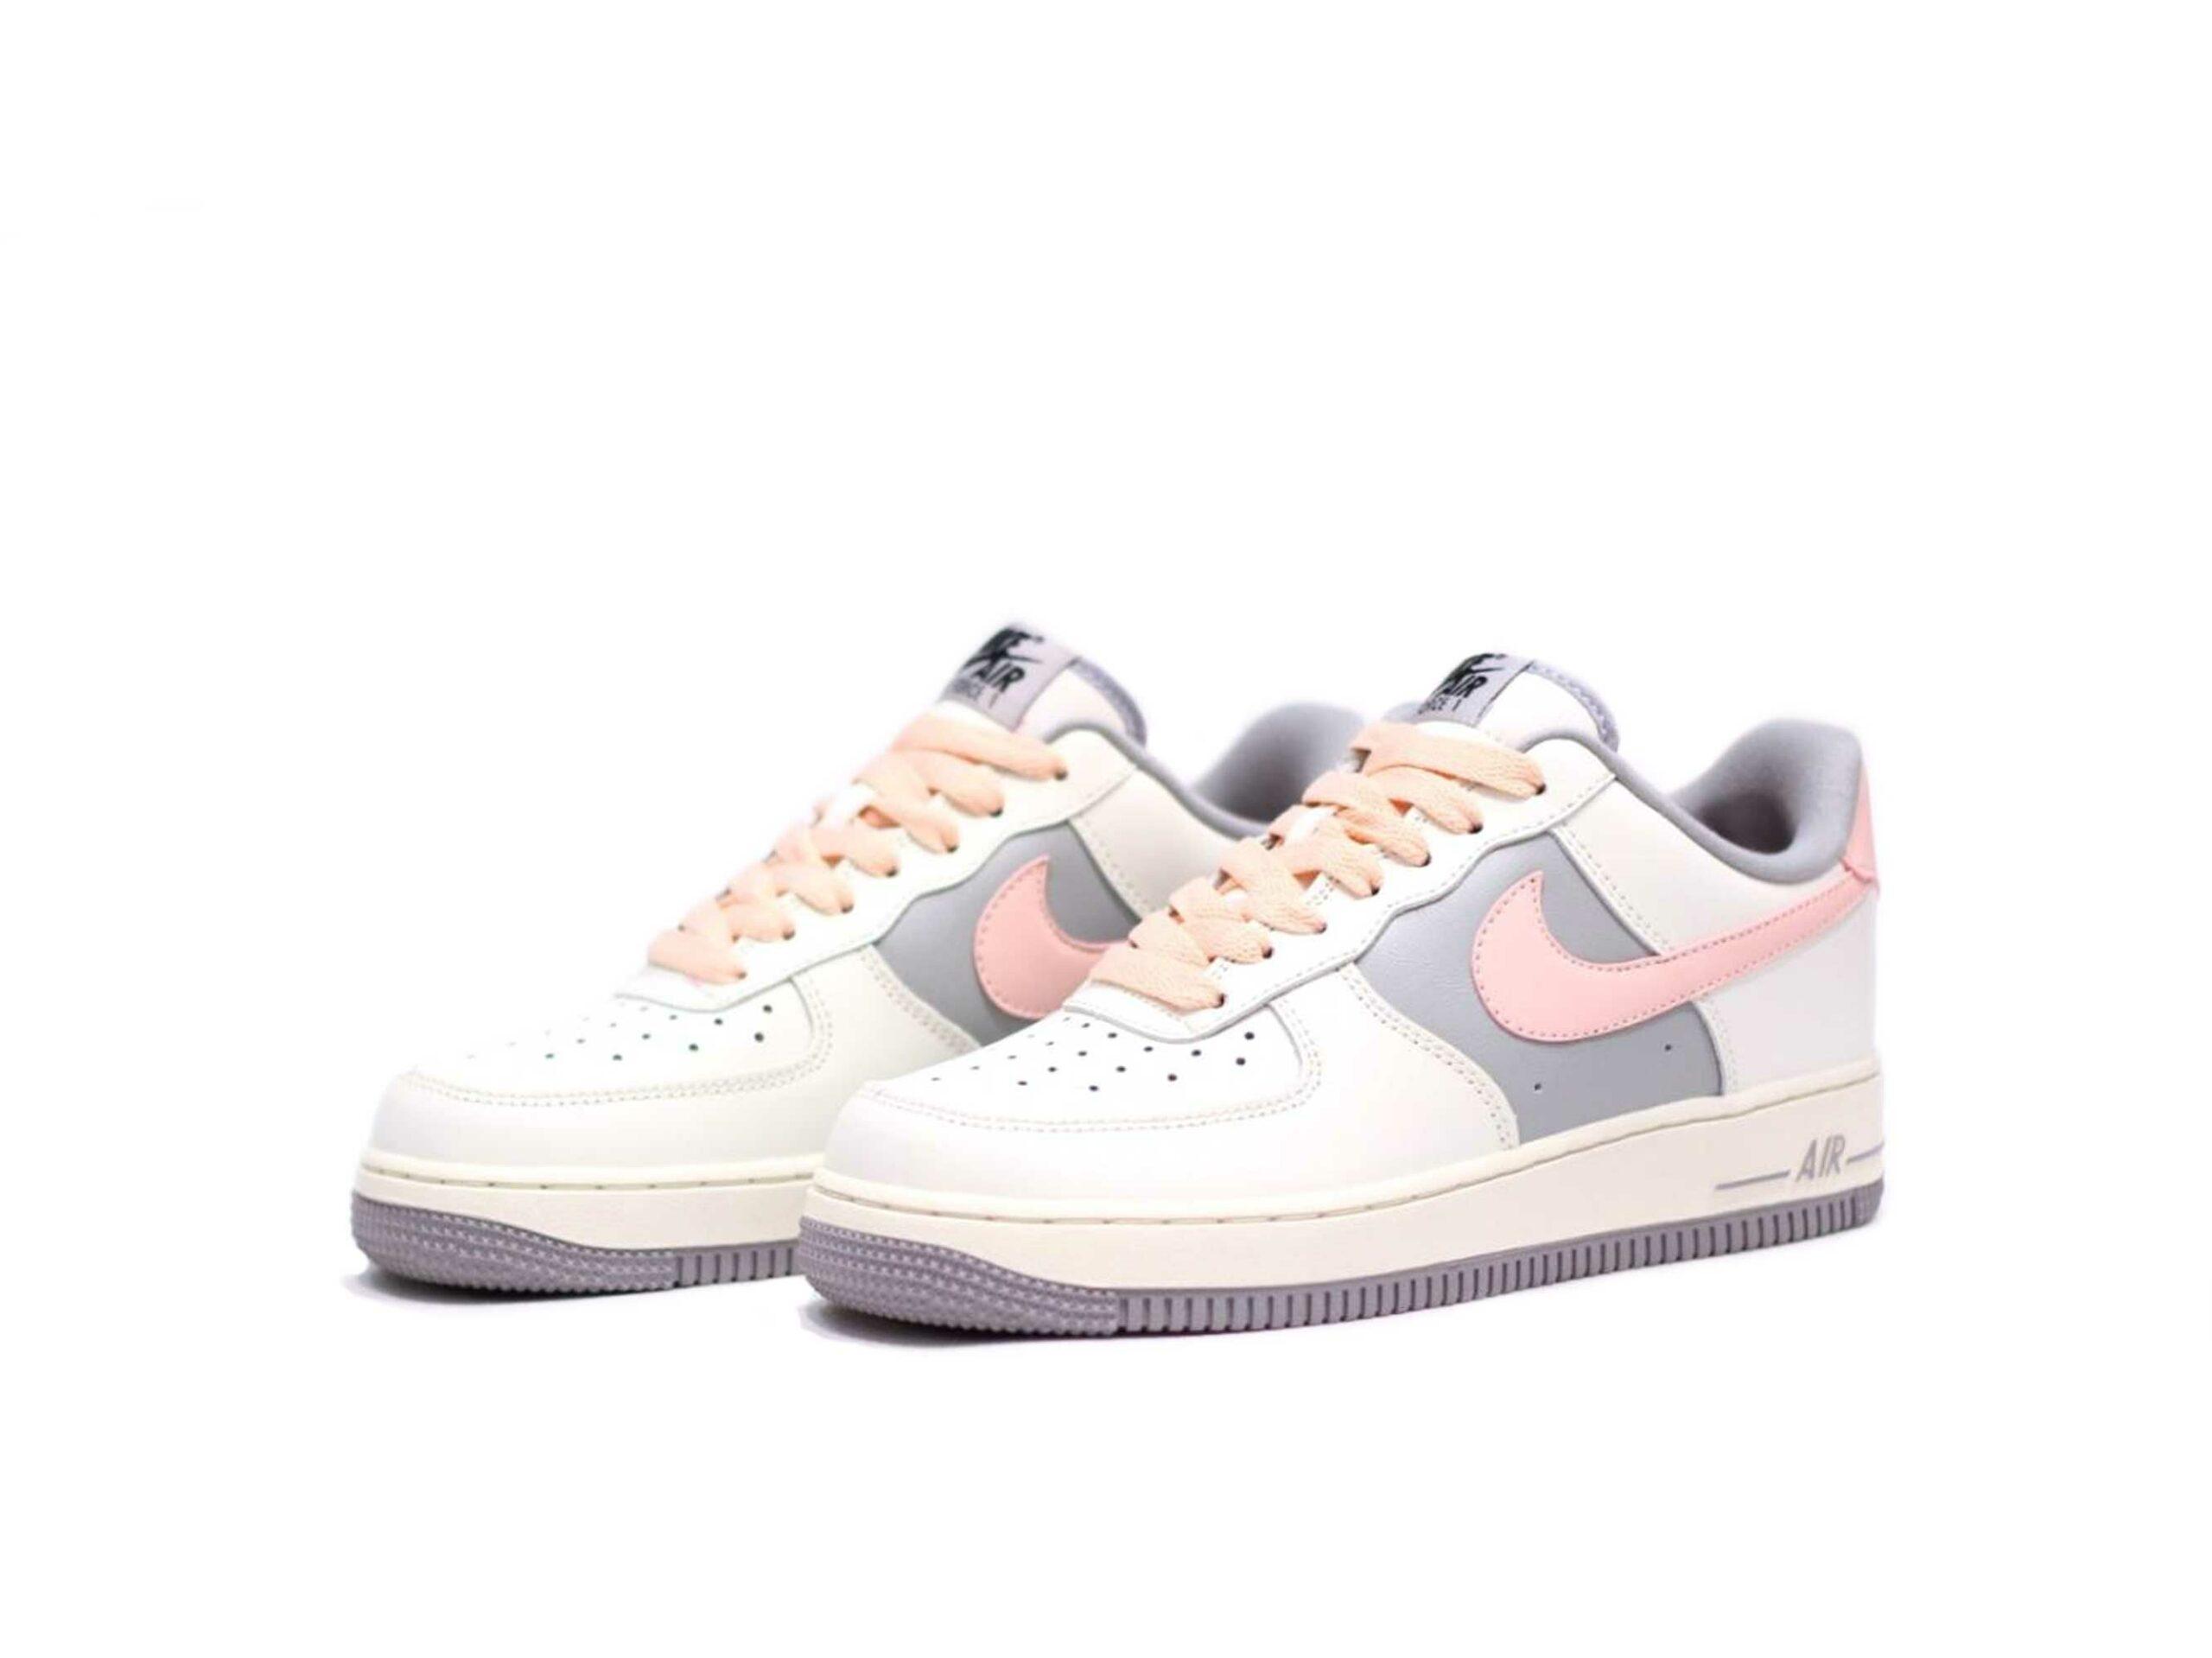 nike air force 1 beige grey pink cw7584_101 купить